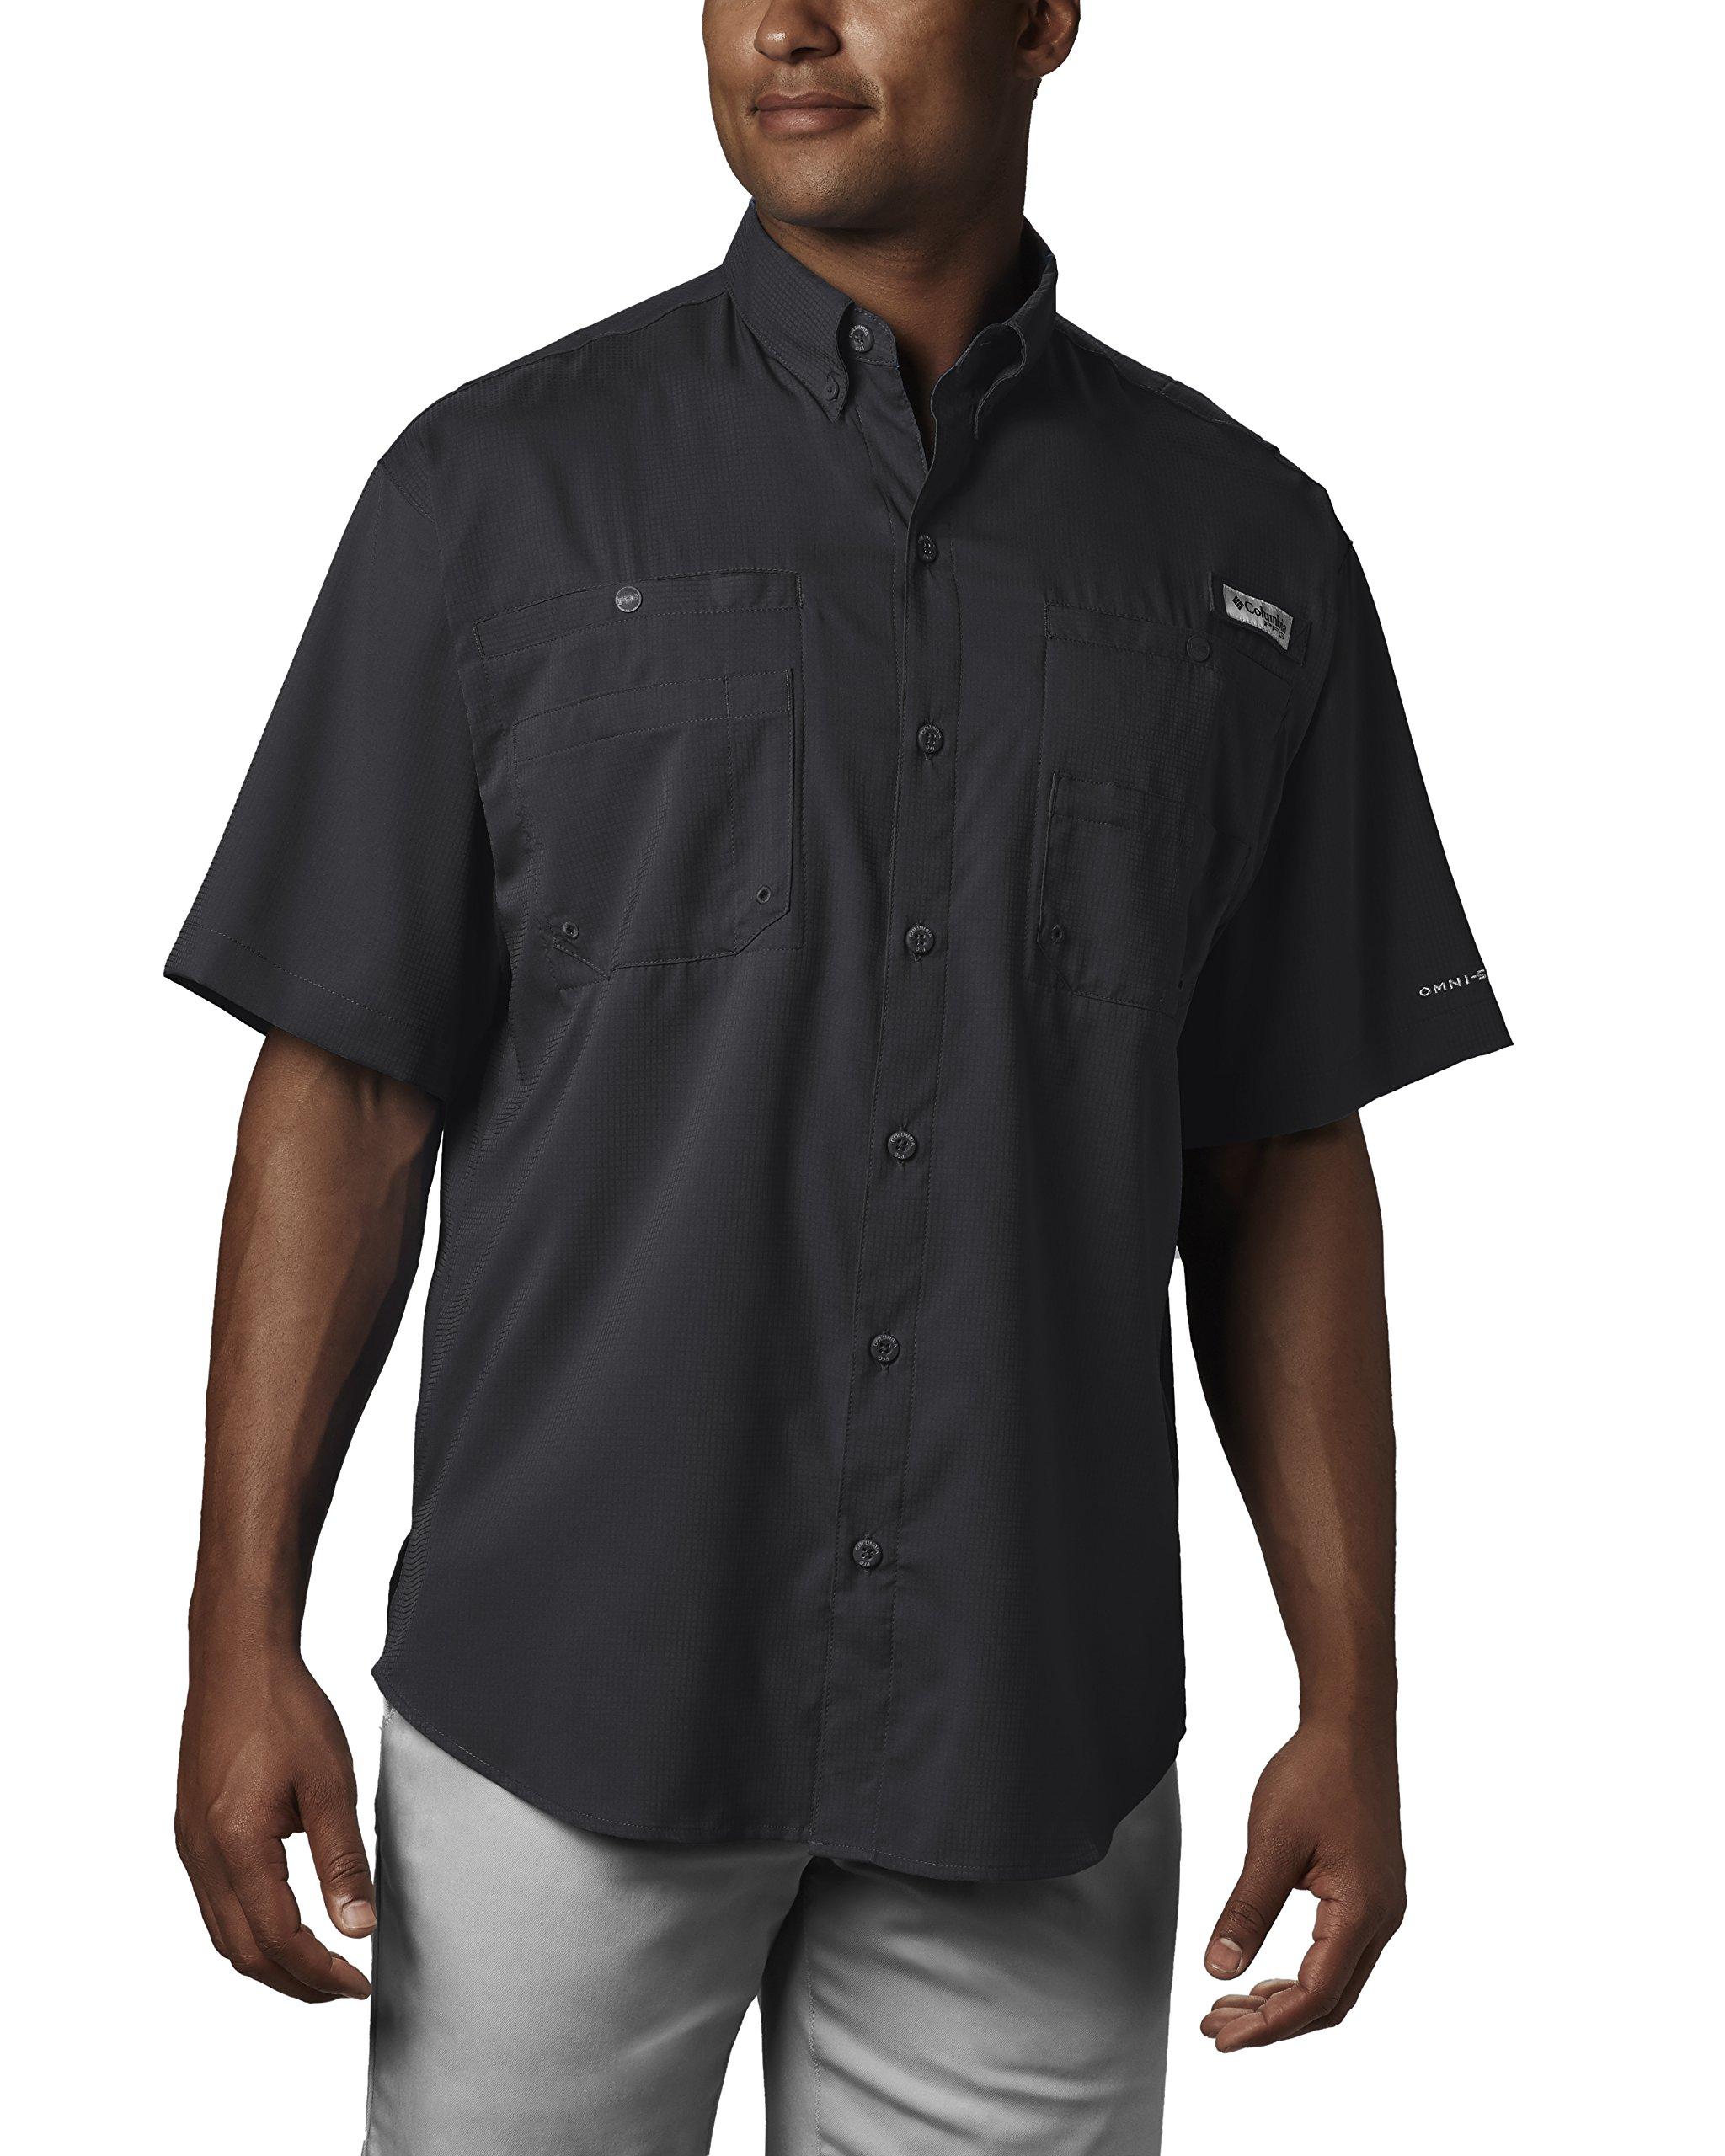 Columbia Men's Tamiami II Short Sleeve Fishing Shirt, Black, X-Small by Columbia (Image #1)